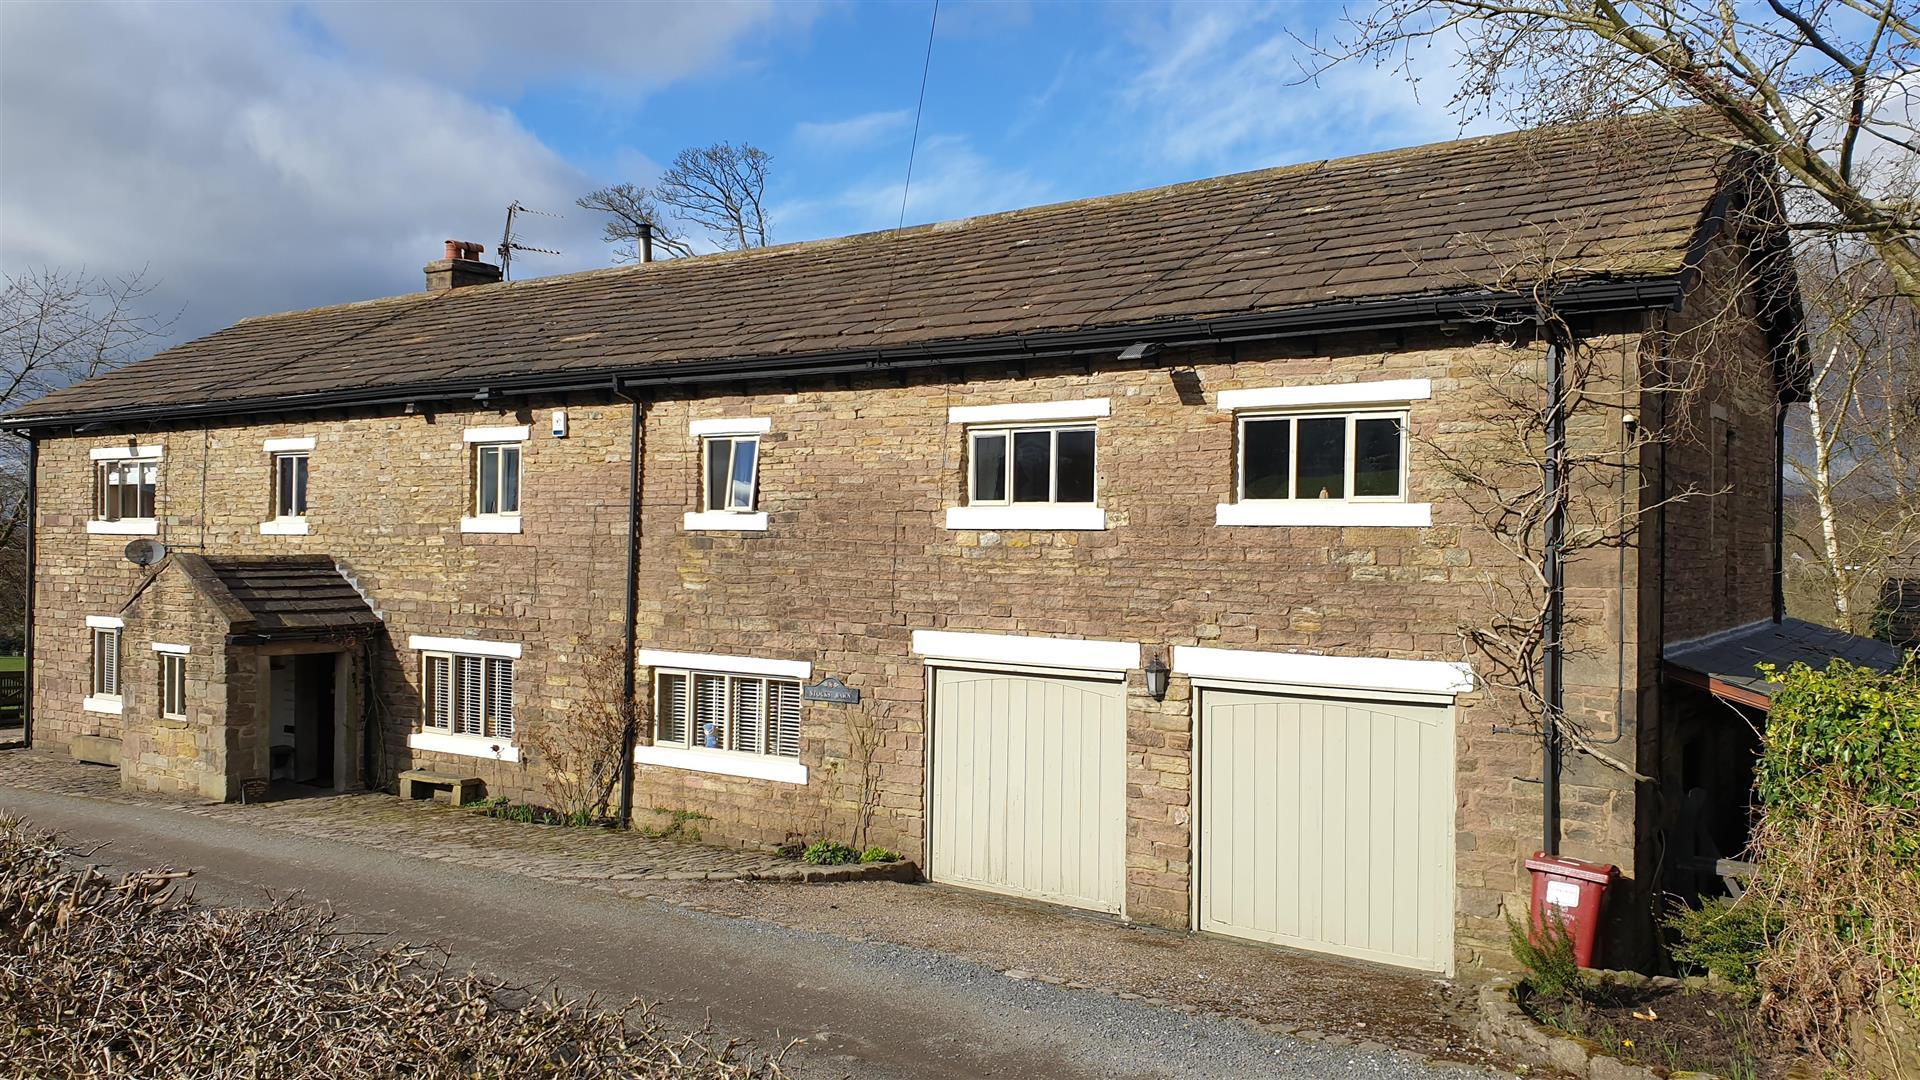 5 Bedroom Barn Conversion For Sale - 20210319_145923.jpg